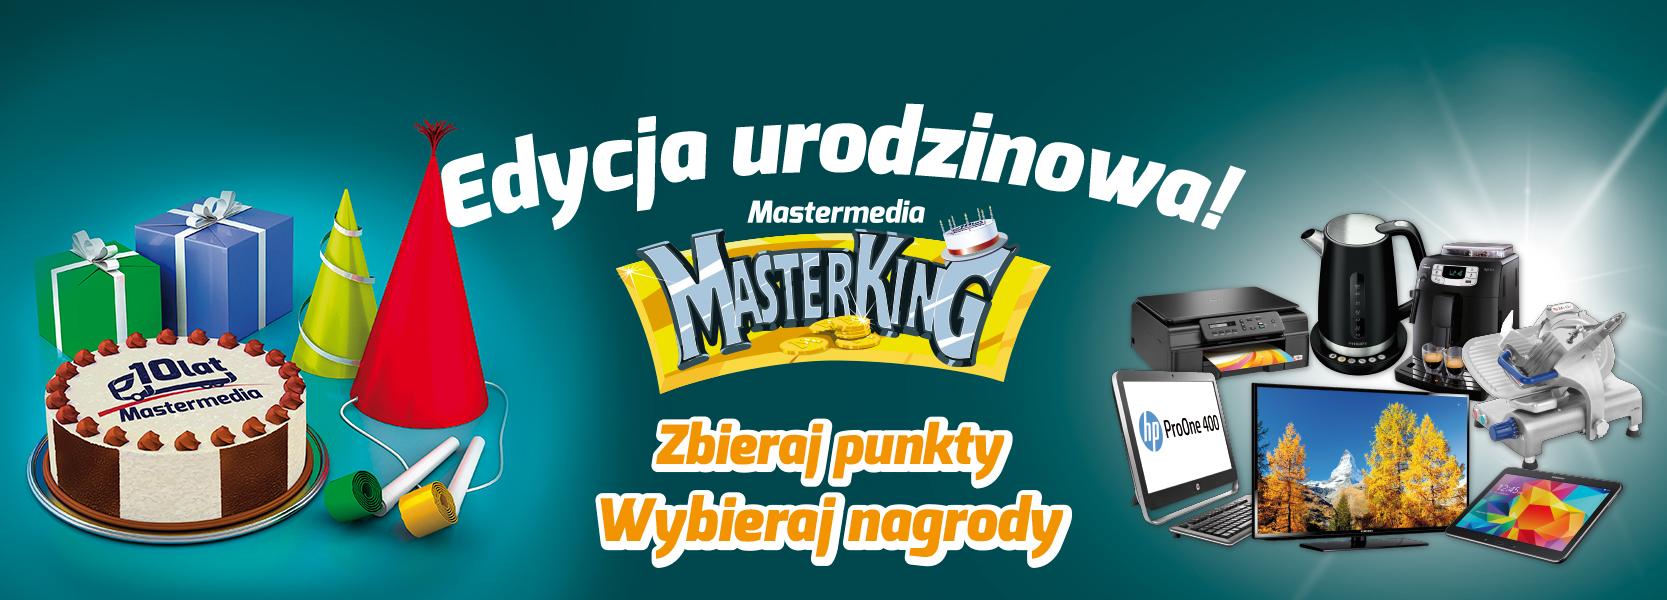 masterking3_slider_1667-x-600